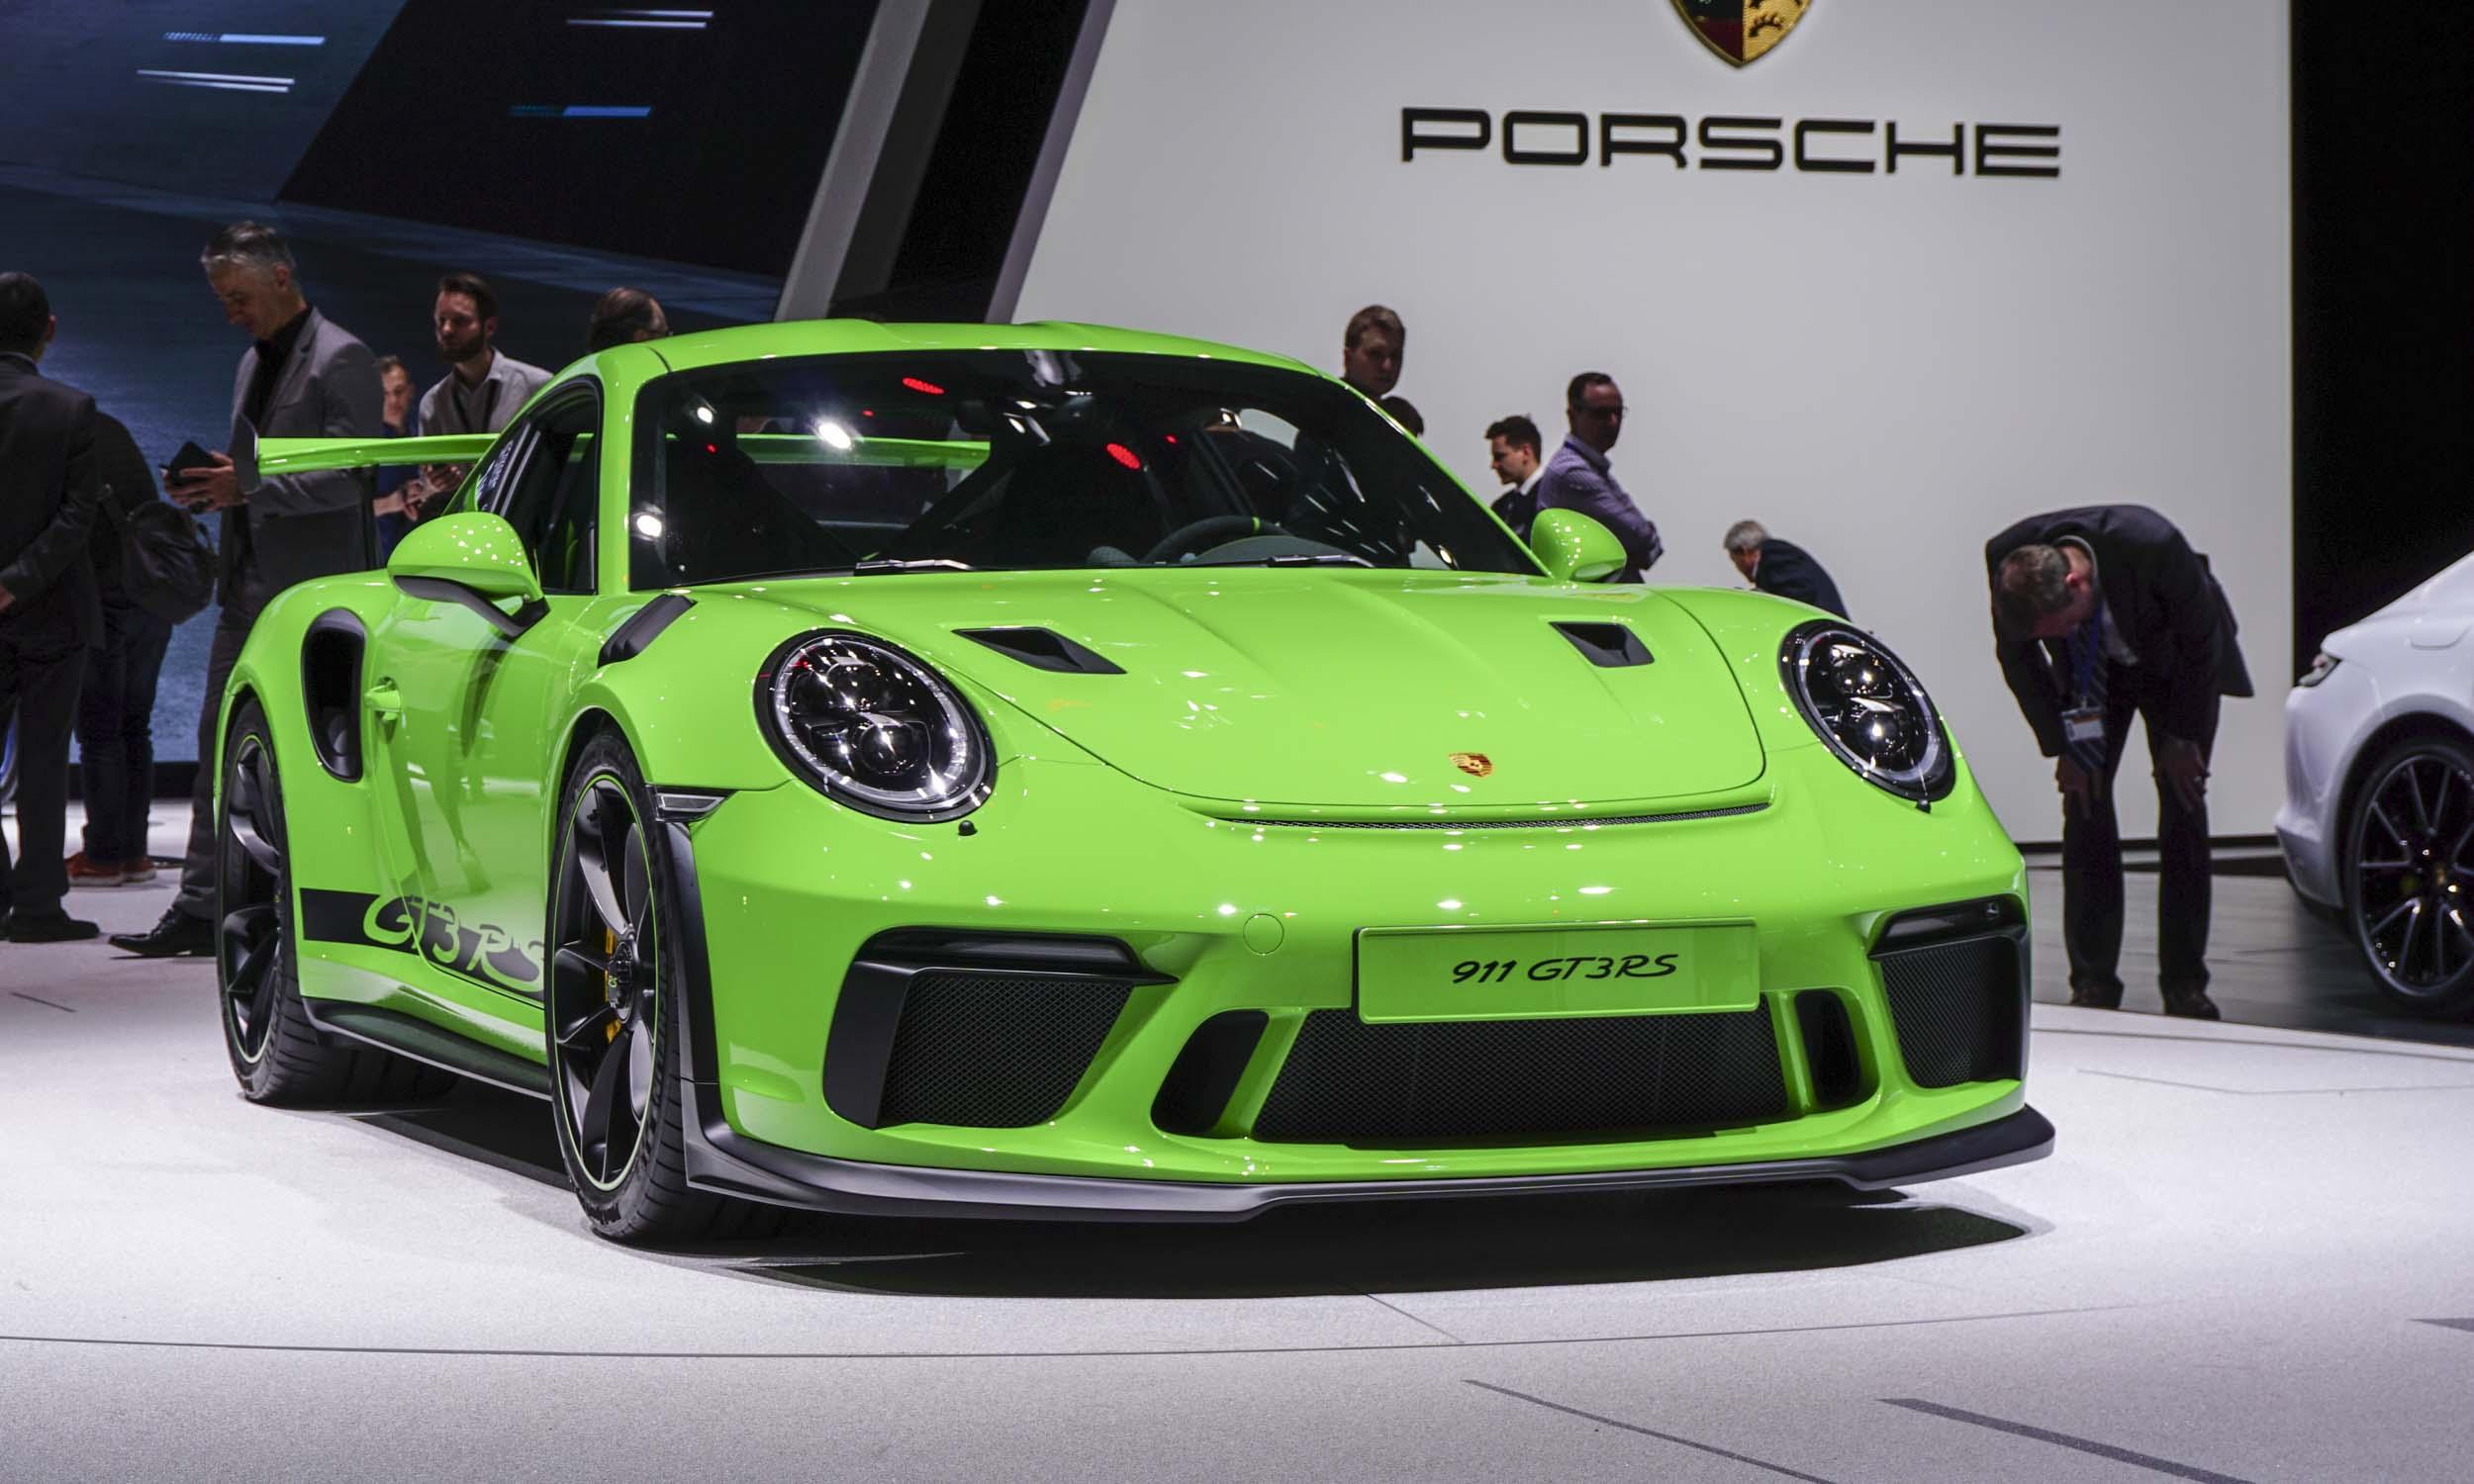 2018 Geneva Motor Show 2019 Porsche 911 Gt3 Rs